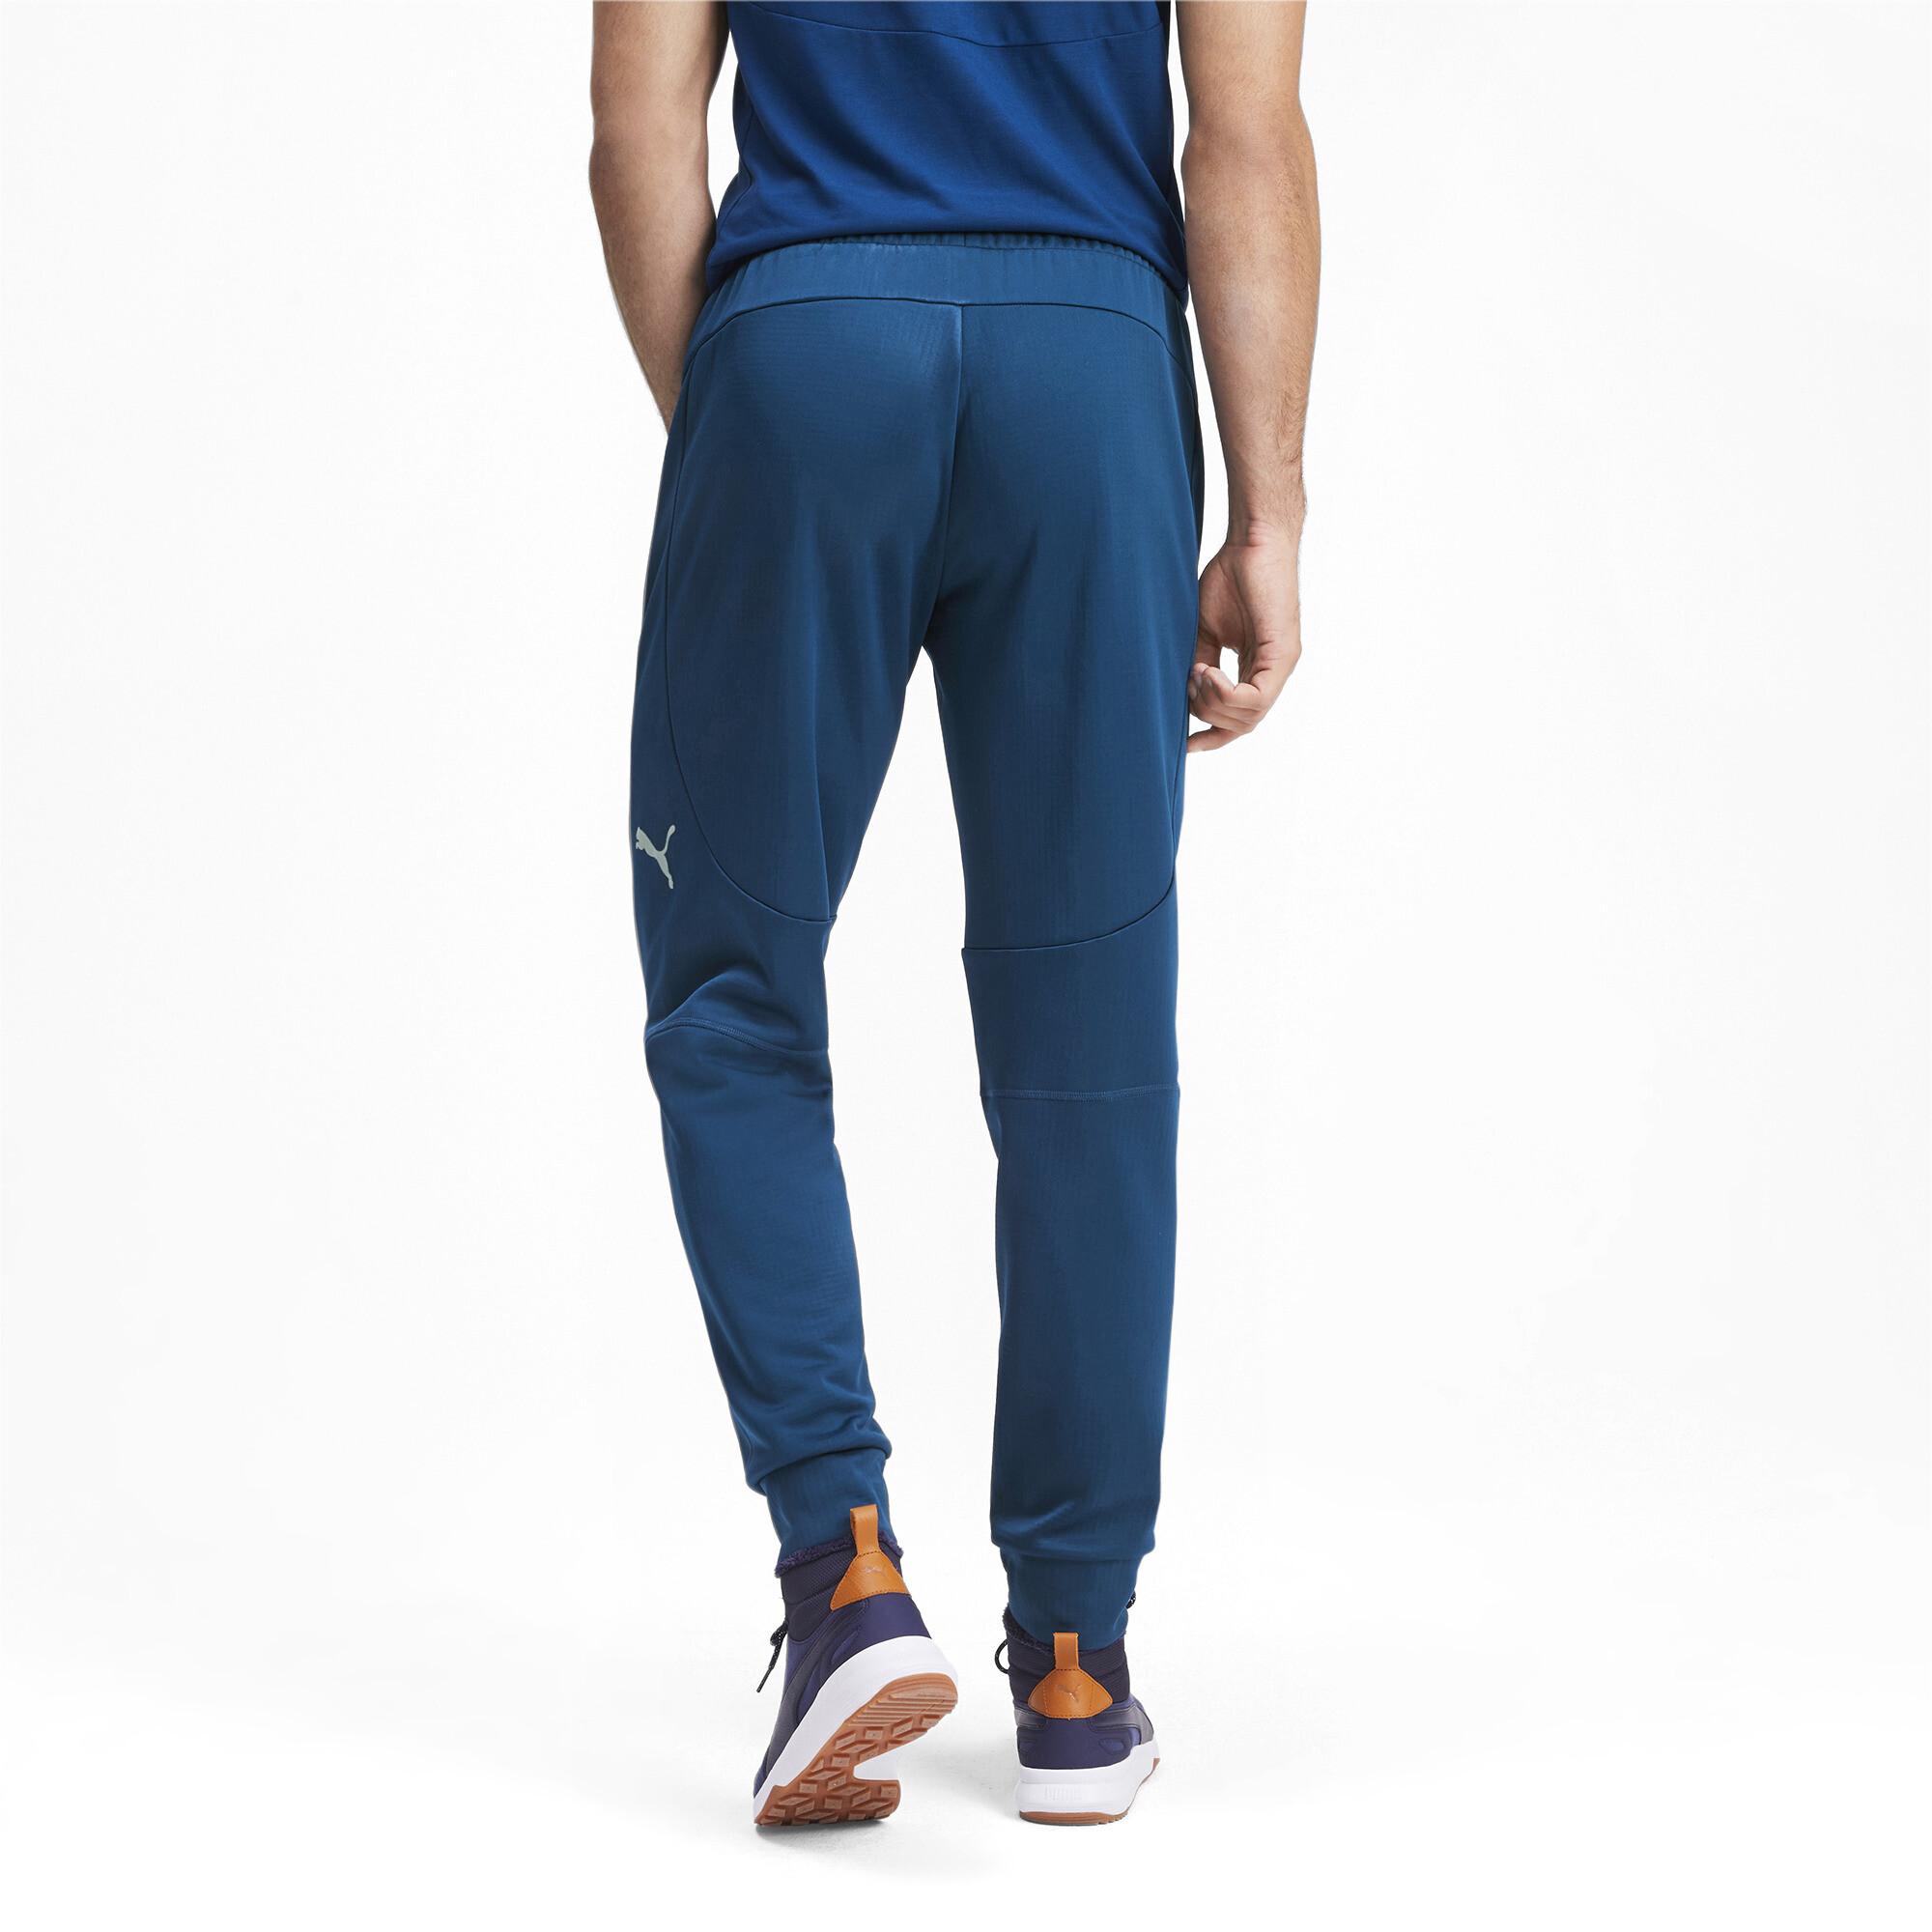 PUMA-Evostripe-Warm-Men-039-s-Pants-Men-Knitted-Pants-Basics miniatura 15